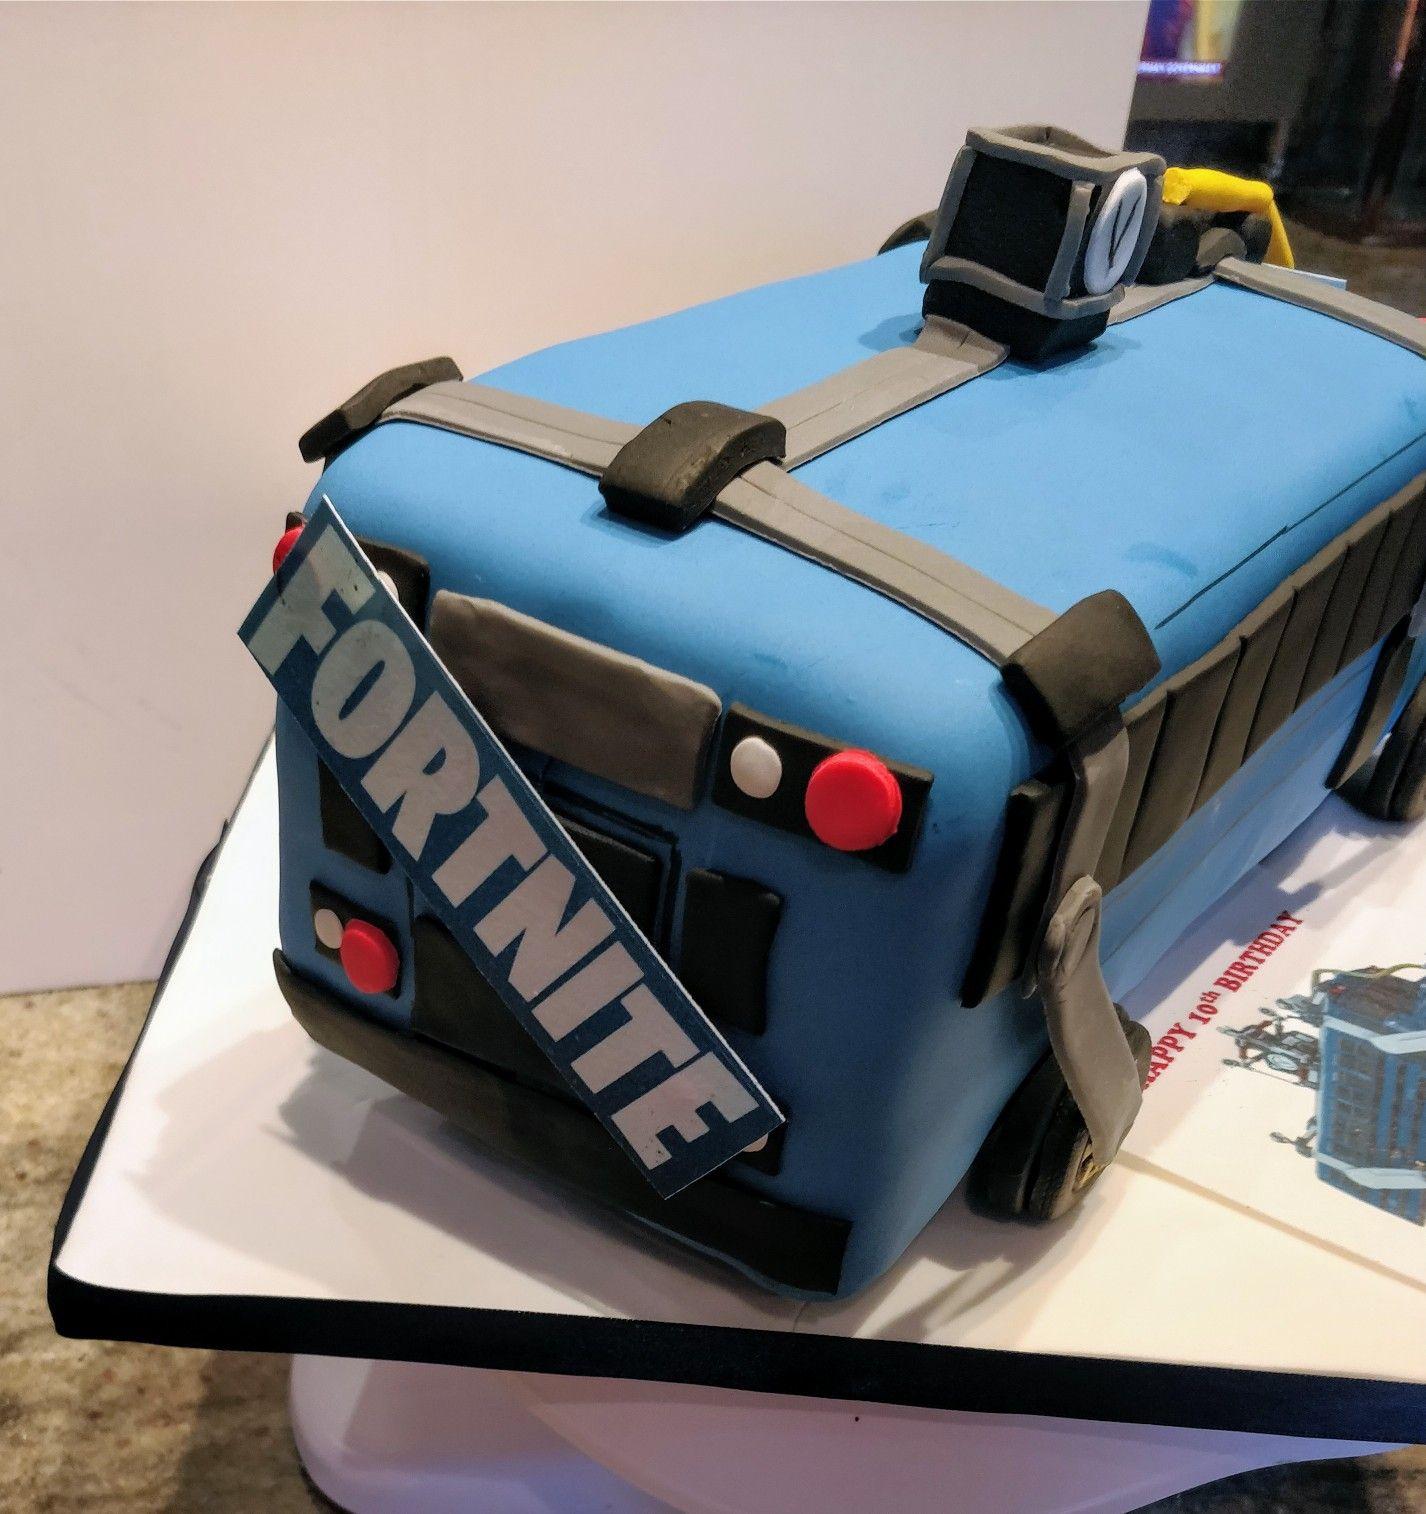 Fortnite Truck Battle Royale Cake I Made